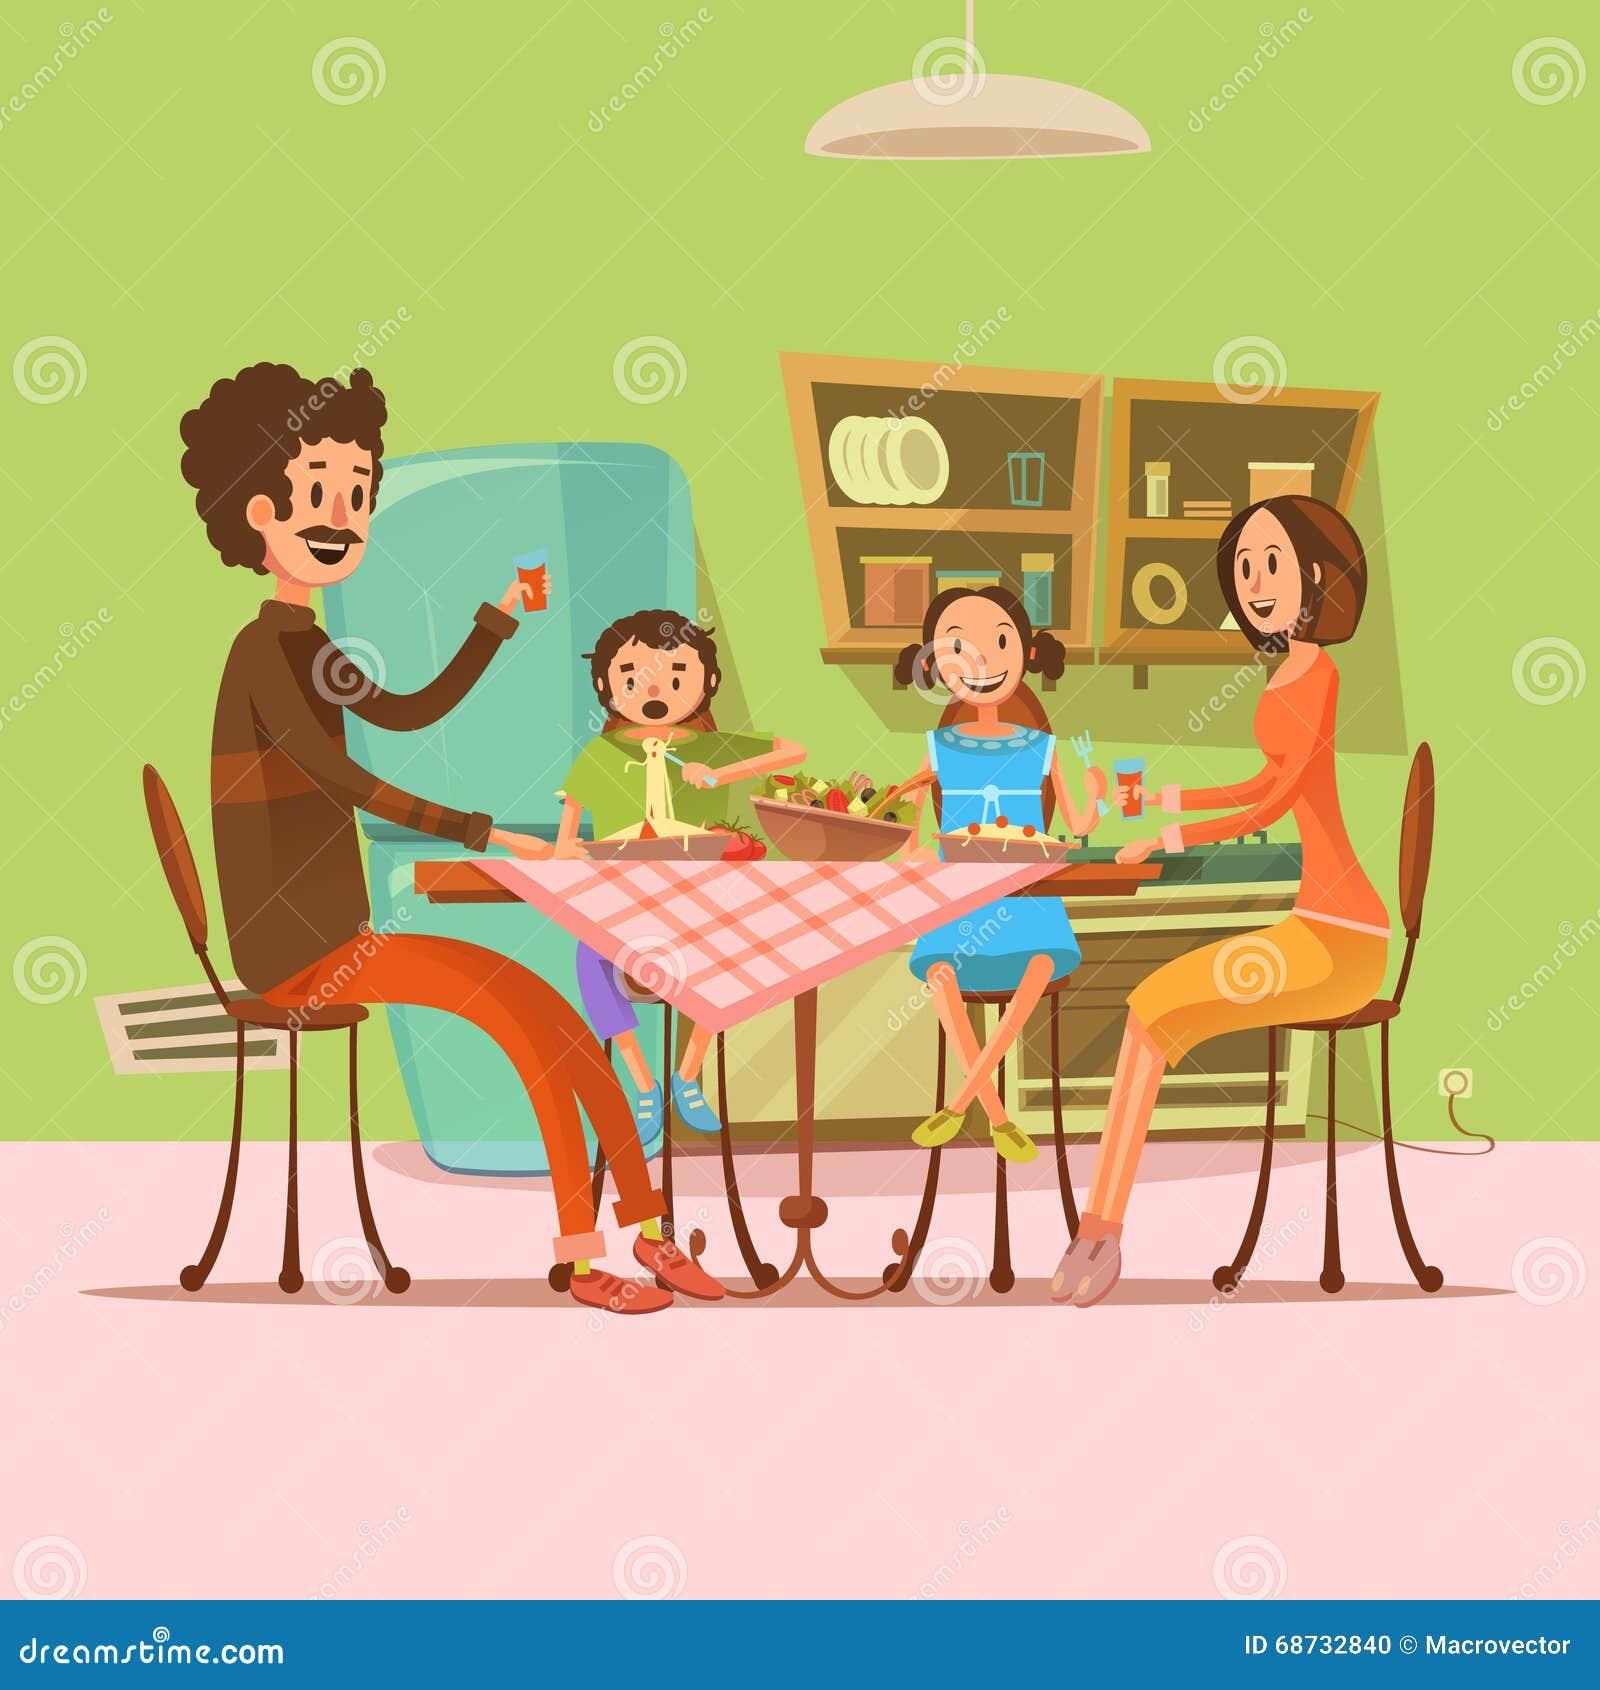 family having meal illustration stock vector image 68732840. Black Bedroom Furniture Sets. Home Design Ideas